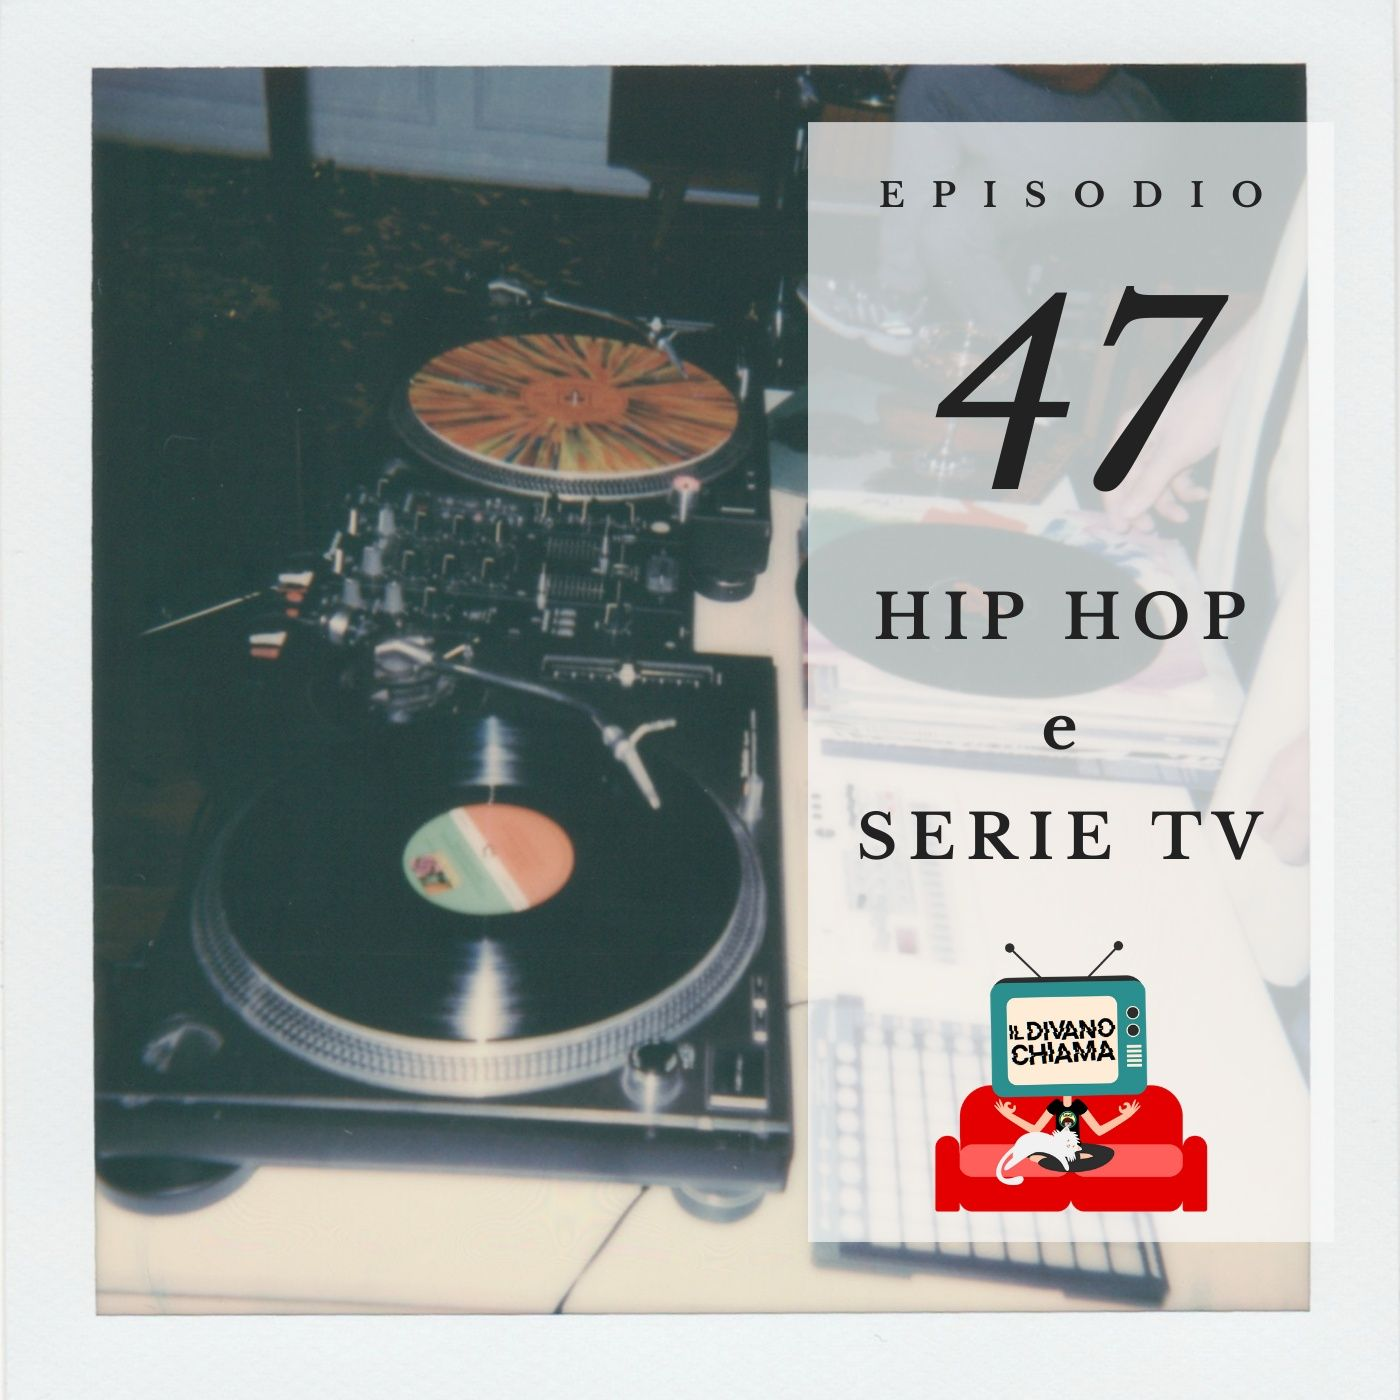 Puntata 47 - Hip hop e serie TV